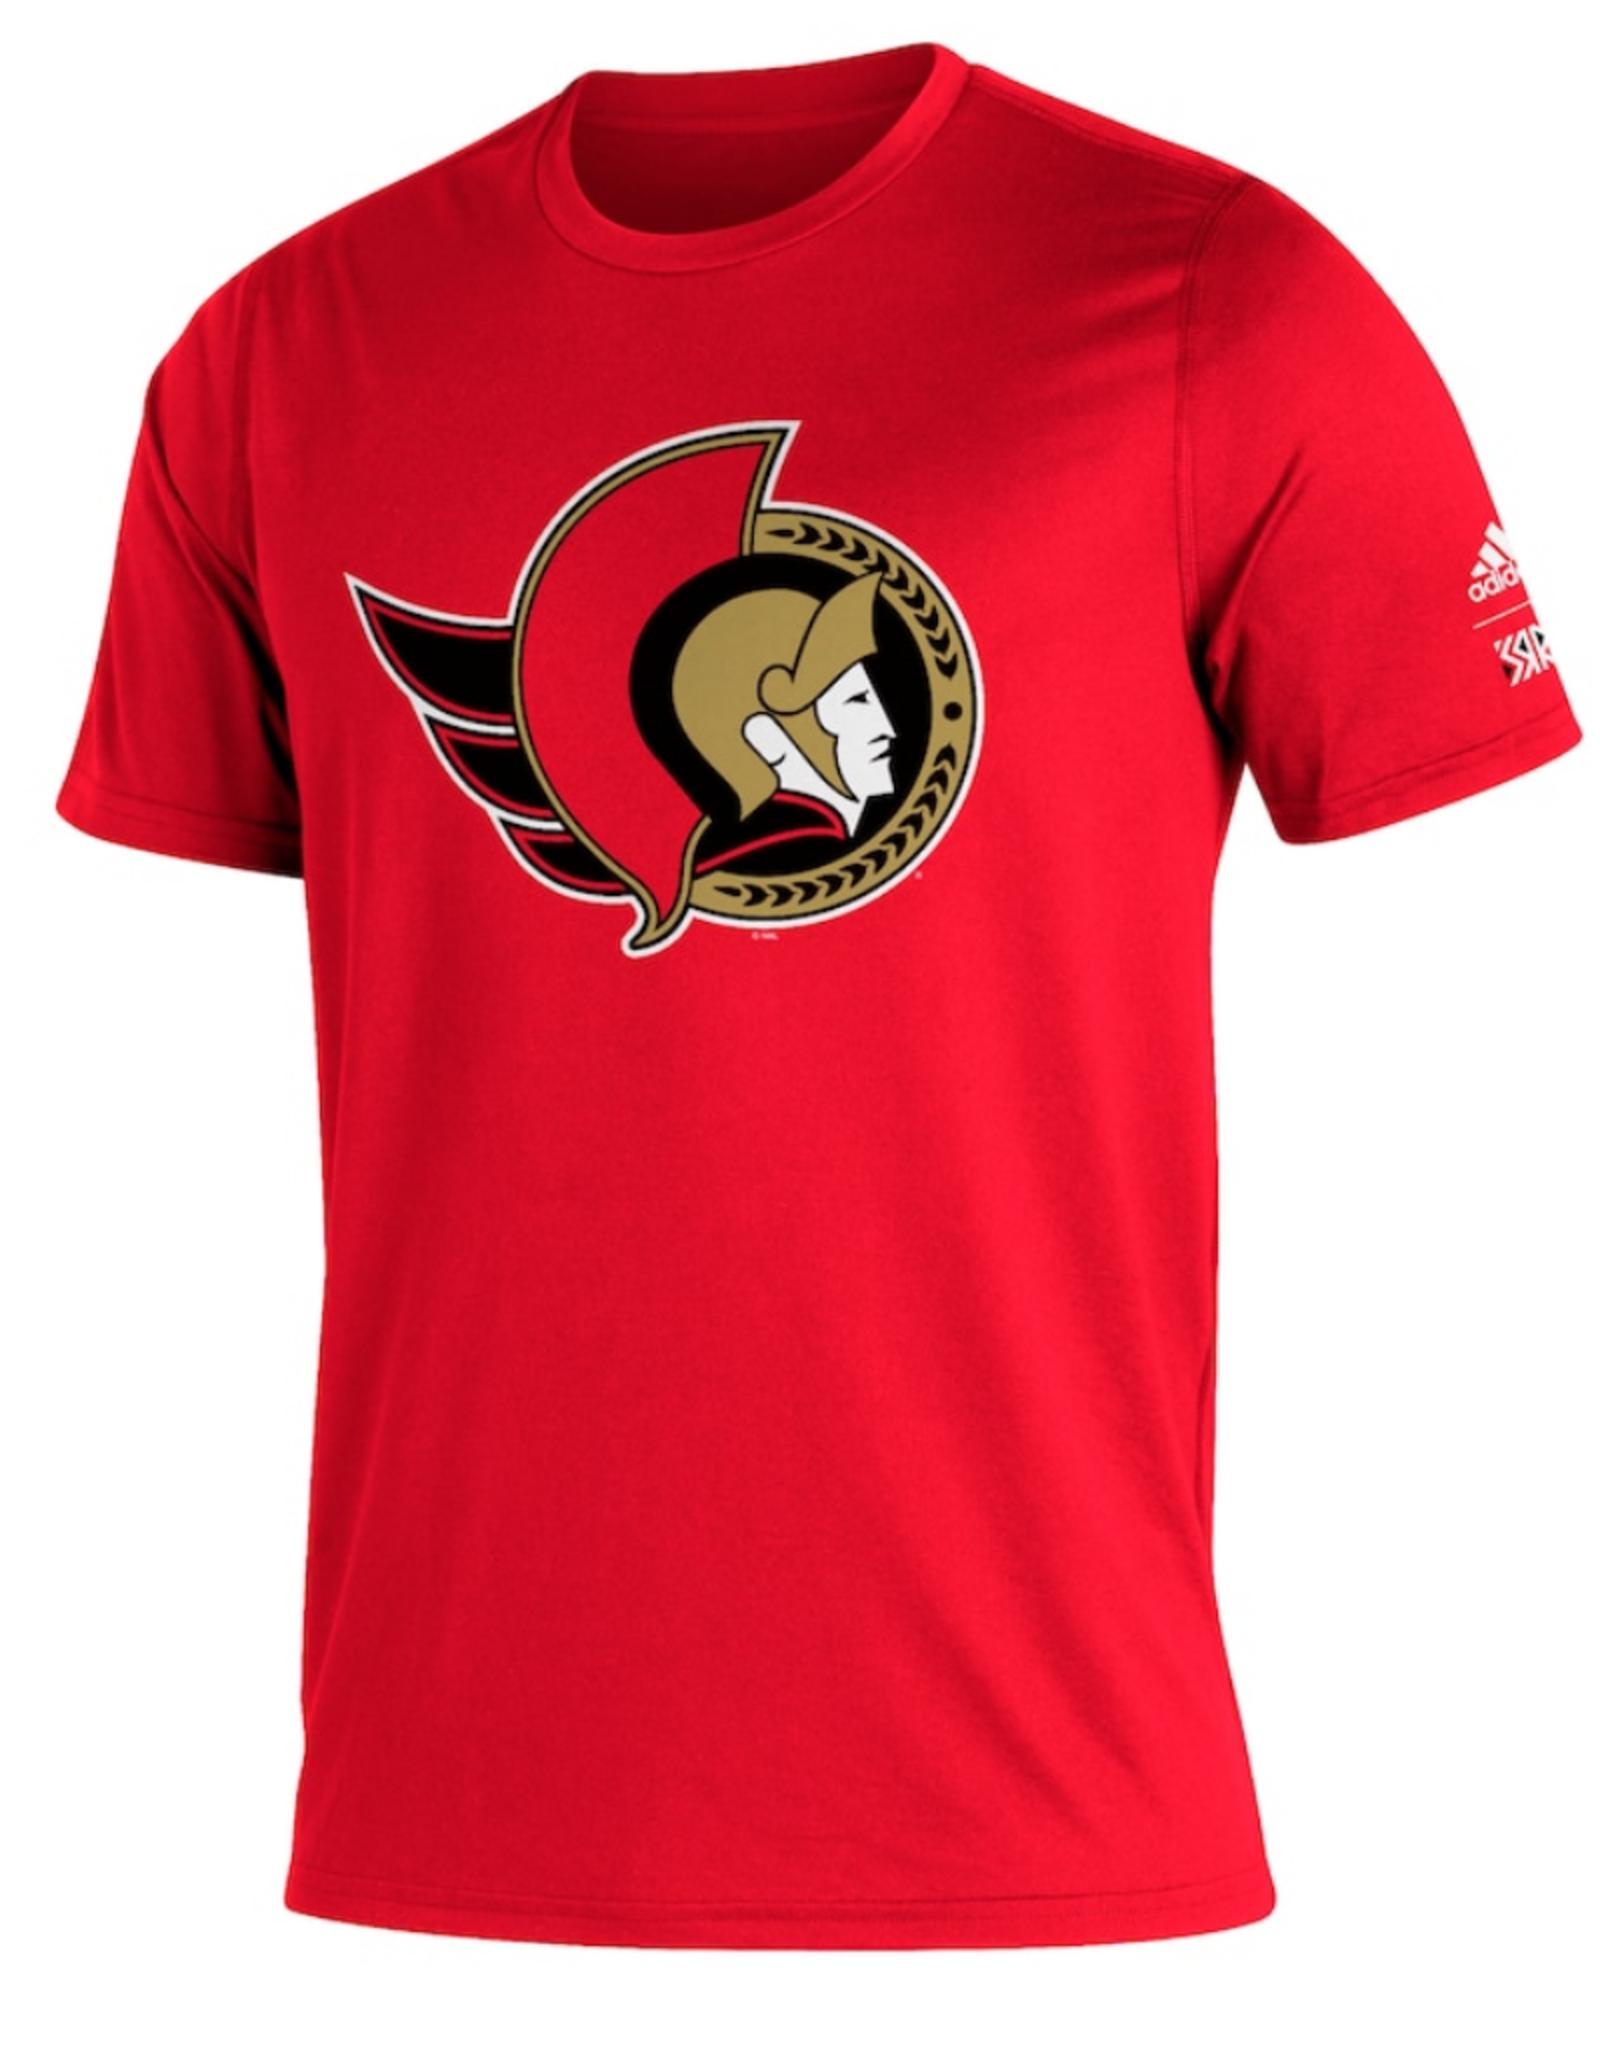 Adidas Adidas Men's Retro Reverse Creator T-Shirt Ottawa Senators Red